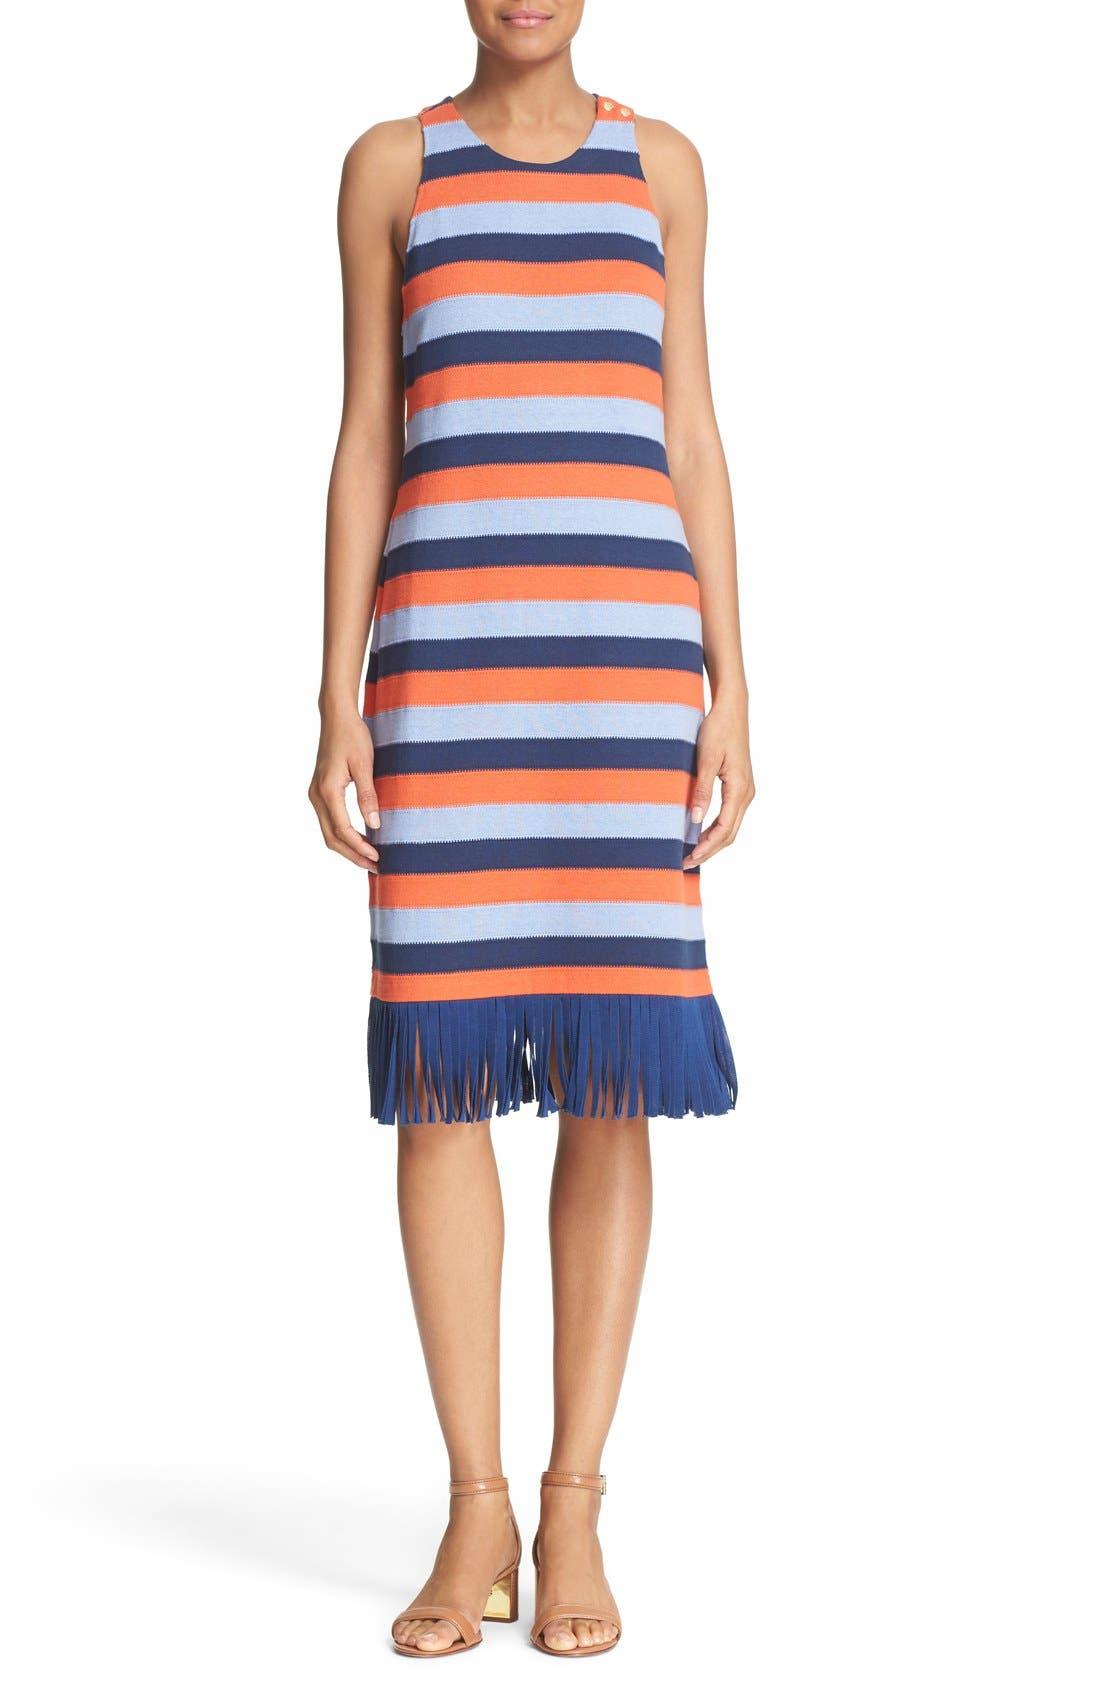 Alternate Image 1 Selected - Tory Burch 'Ariana' Fringe Hem Stripe Tank Dress